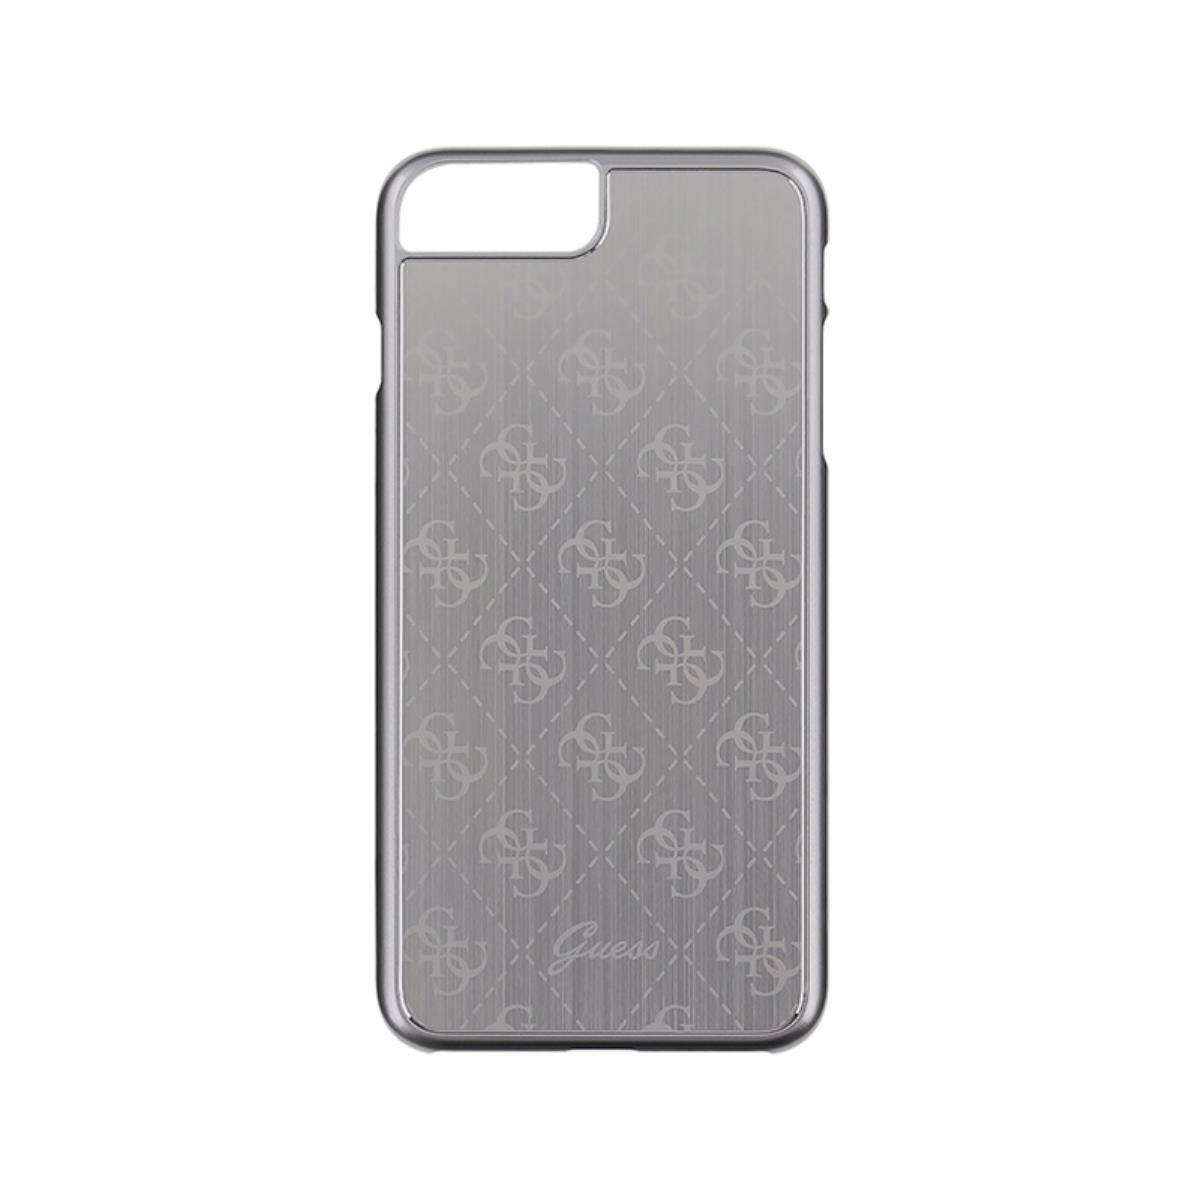 d068eb8e4 Compre online Funda Metalica Hardcase Guess iPhone 7 Plus Plateado  (GUHCP7LMESI)